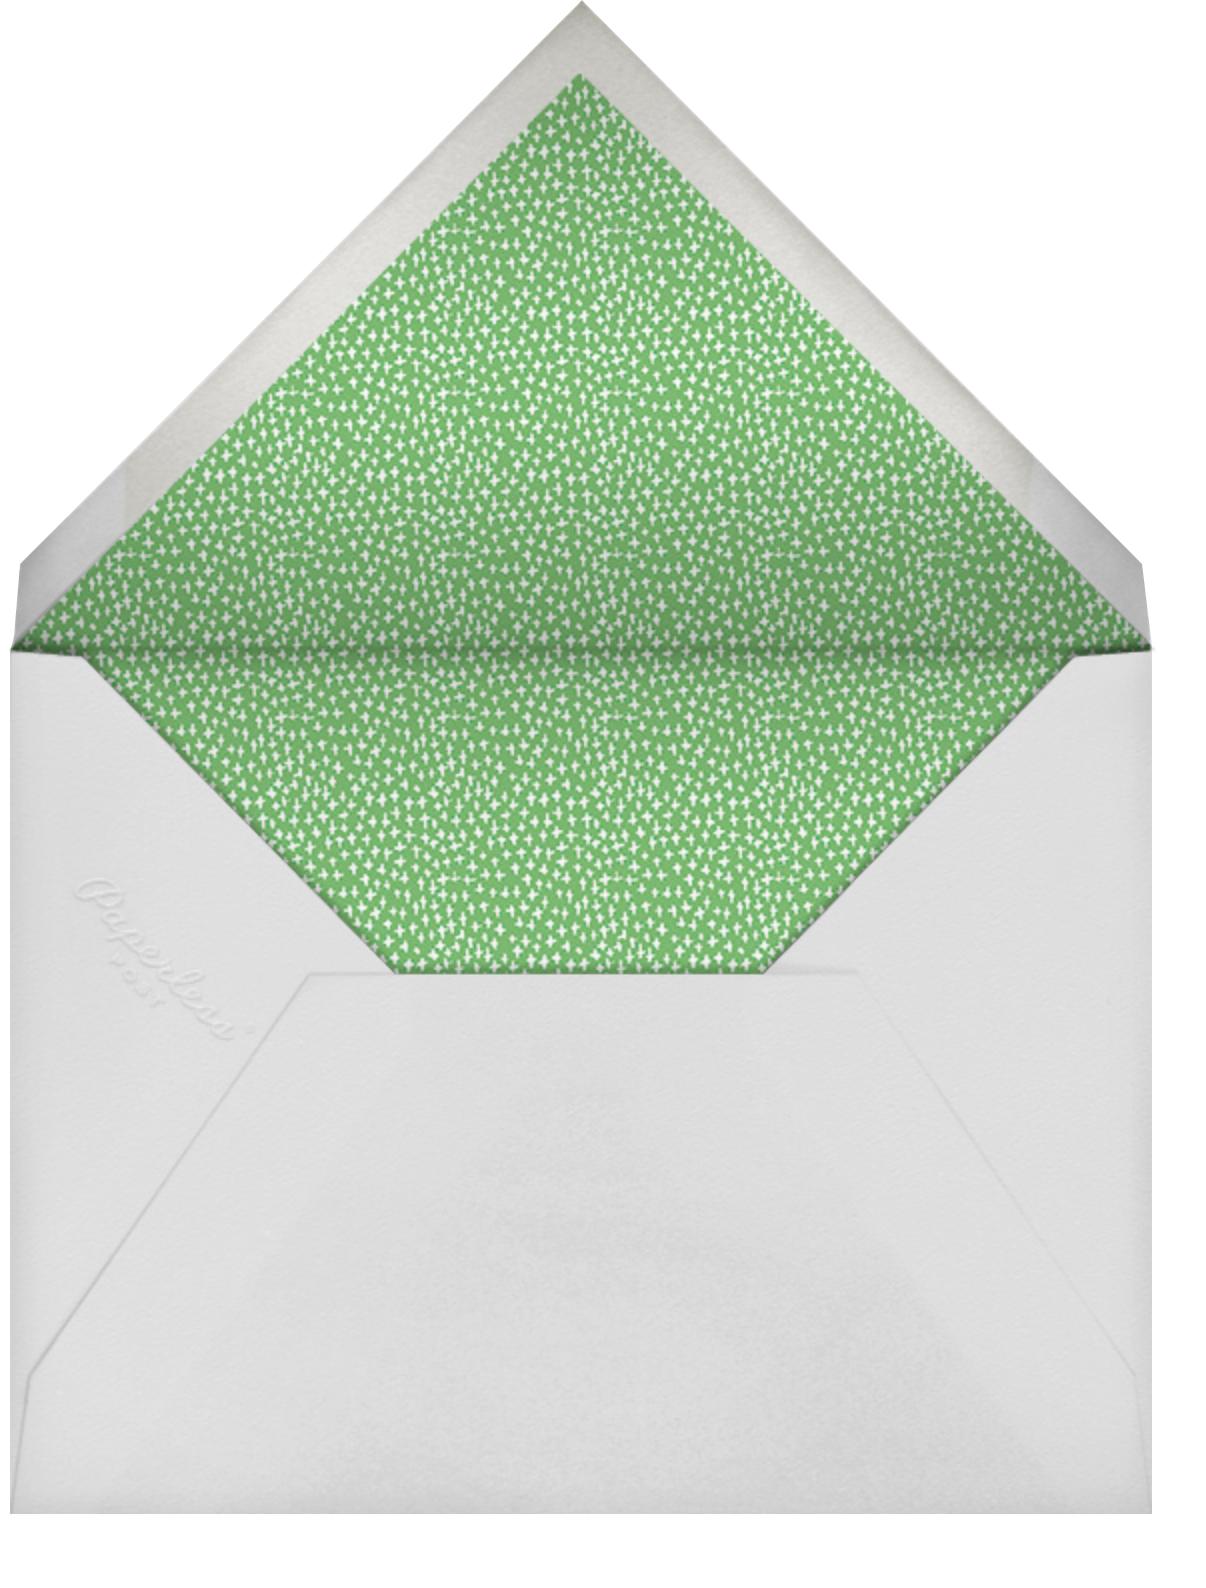 Among the Daisies - Lavender - Mr. Boddington's Studio - Easter - envelope back